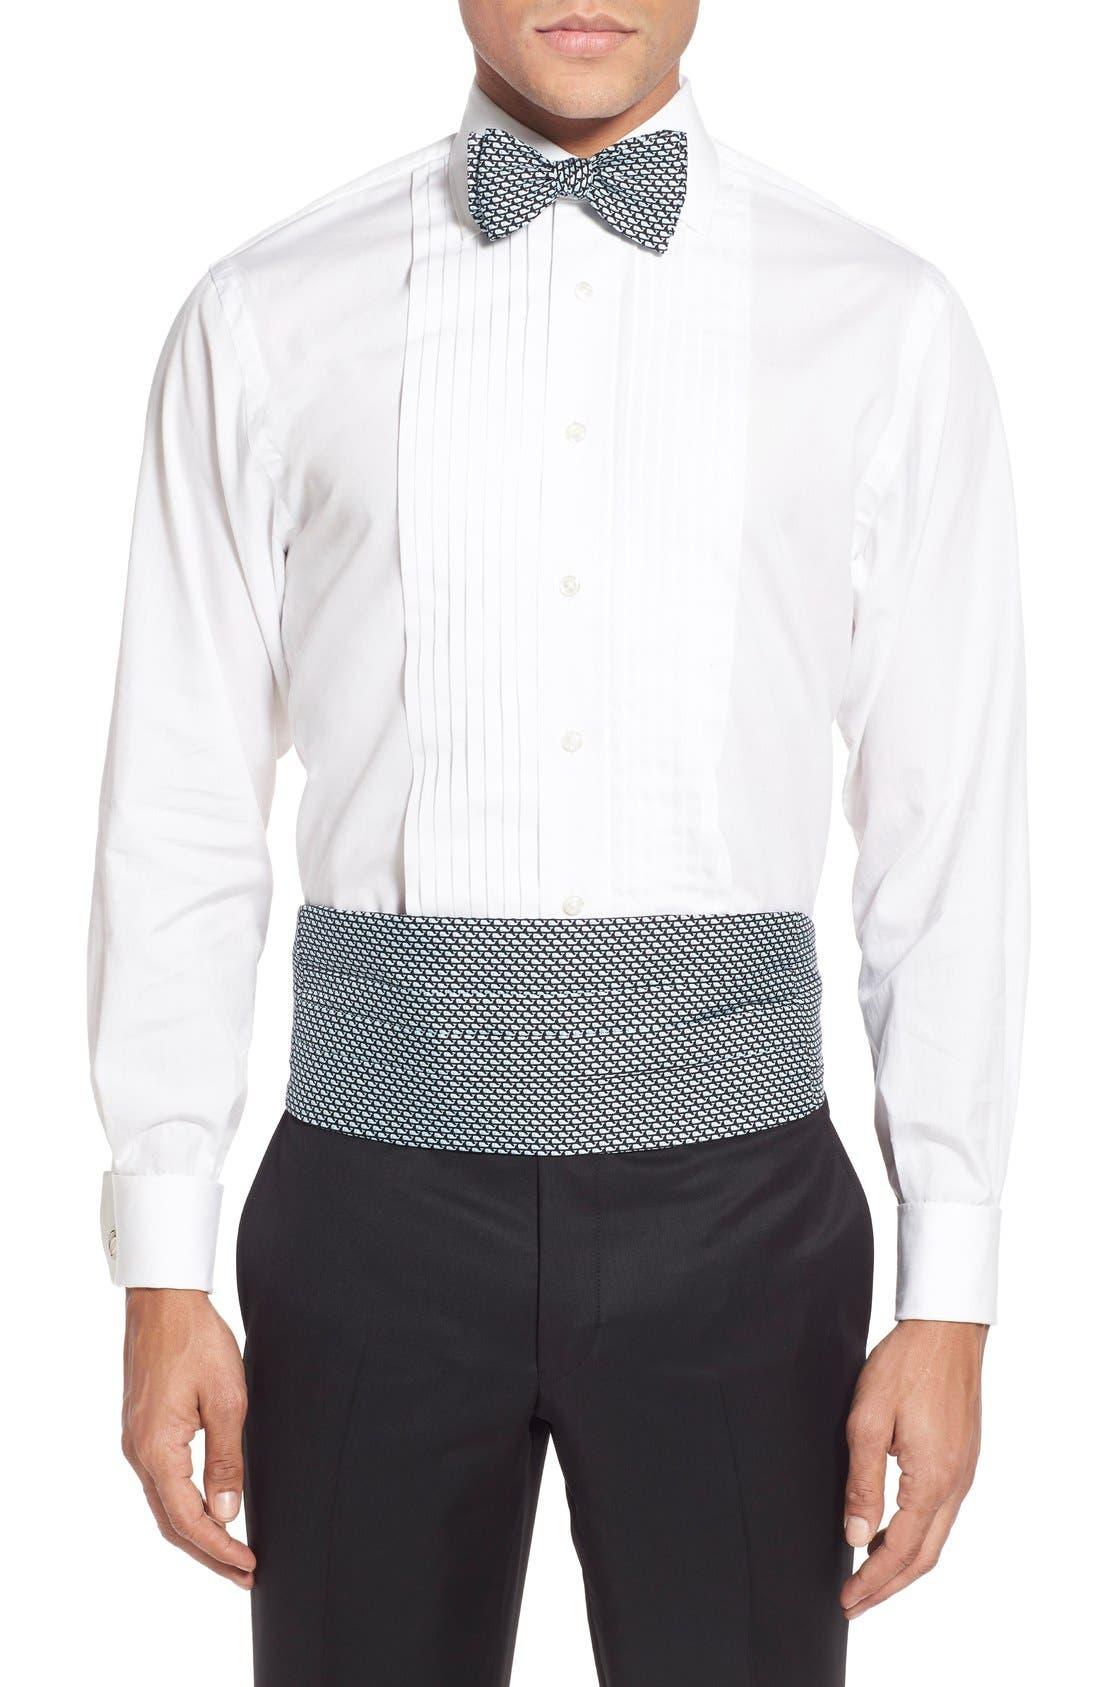 Whale Print Cummerbund & Self-Tie Bow Tie,                         Main,                         color, Black